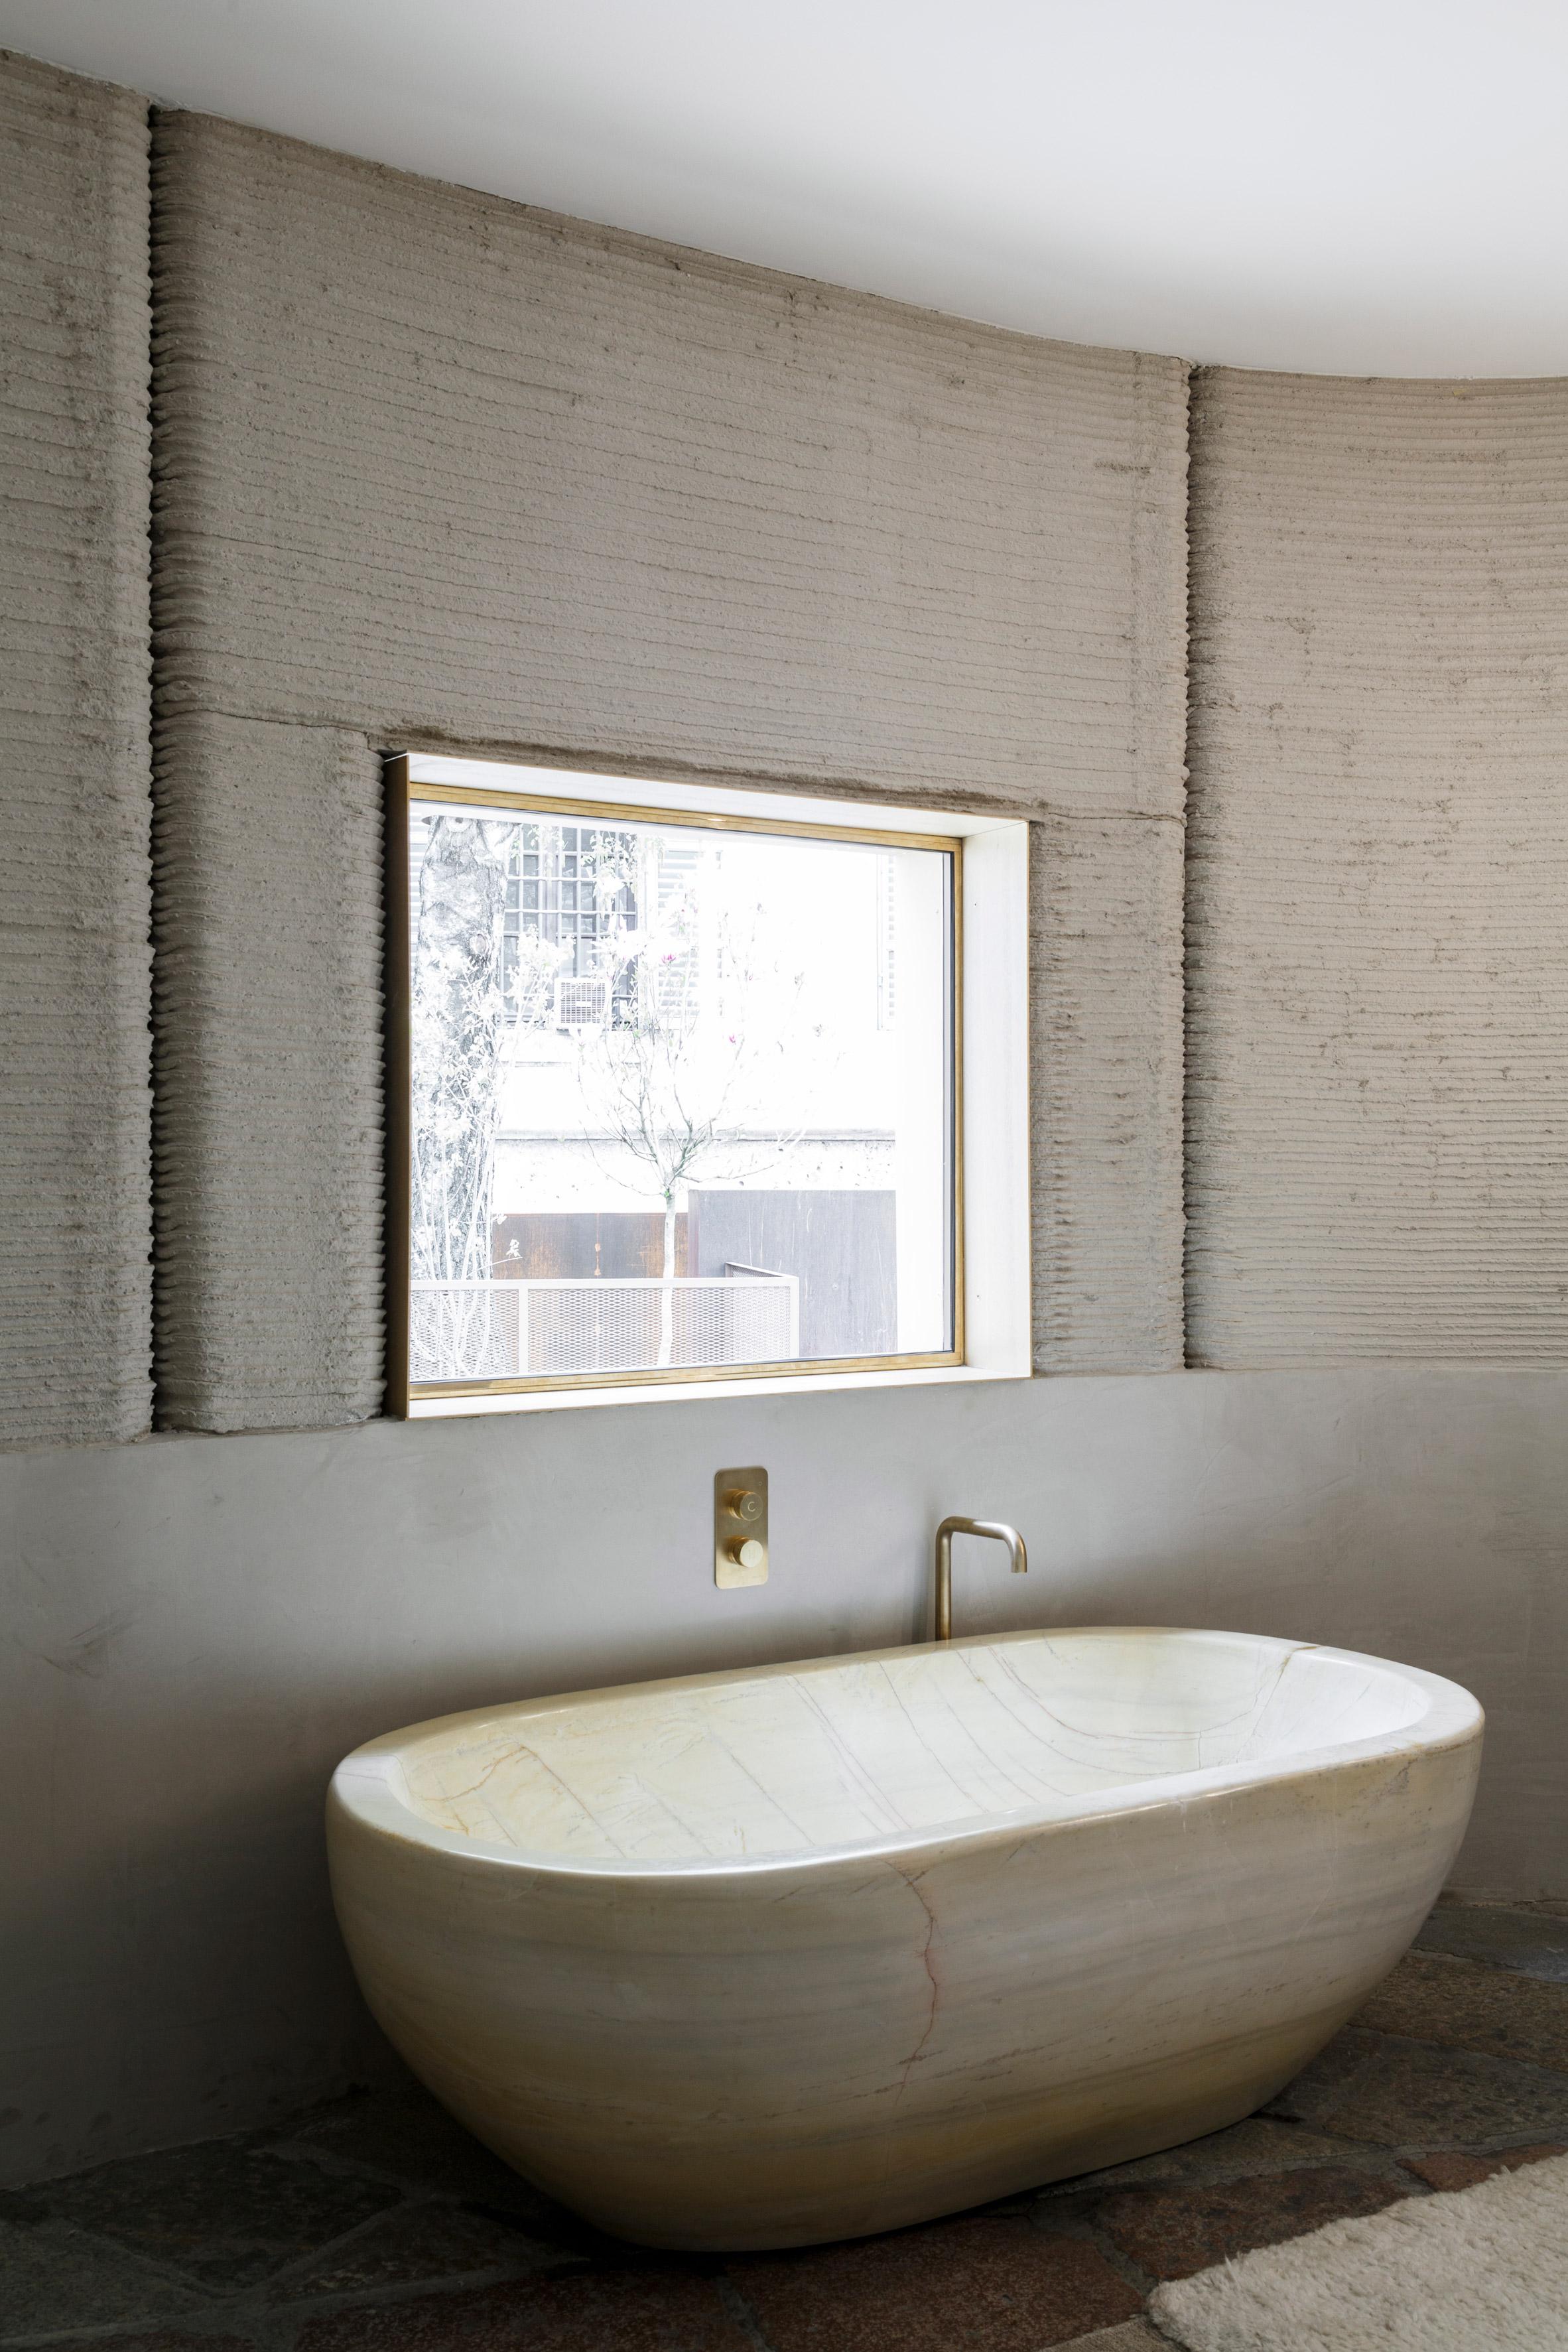 حمام خانه پرینت سه بعدی